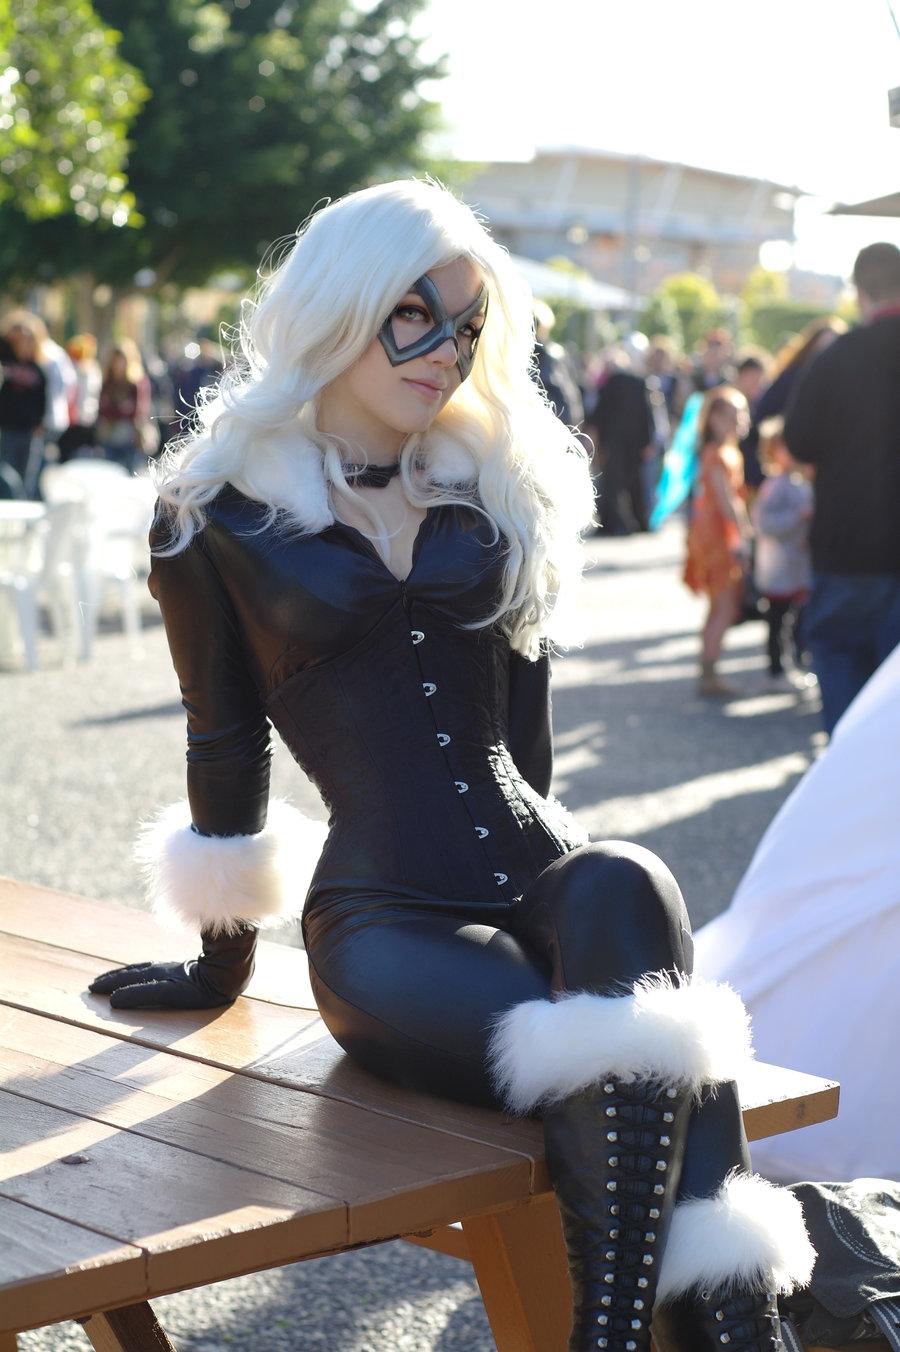 BadLuckKitty is Black Cat | Photo byXxnatto